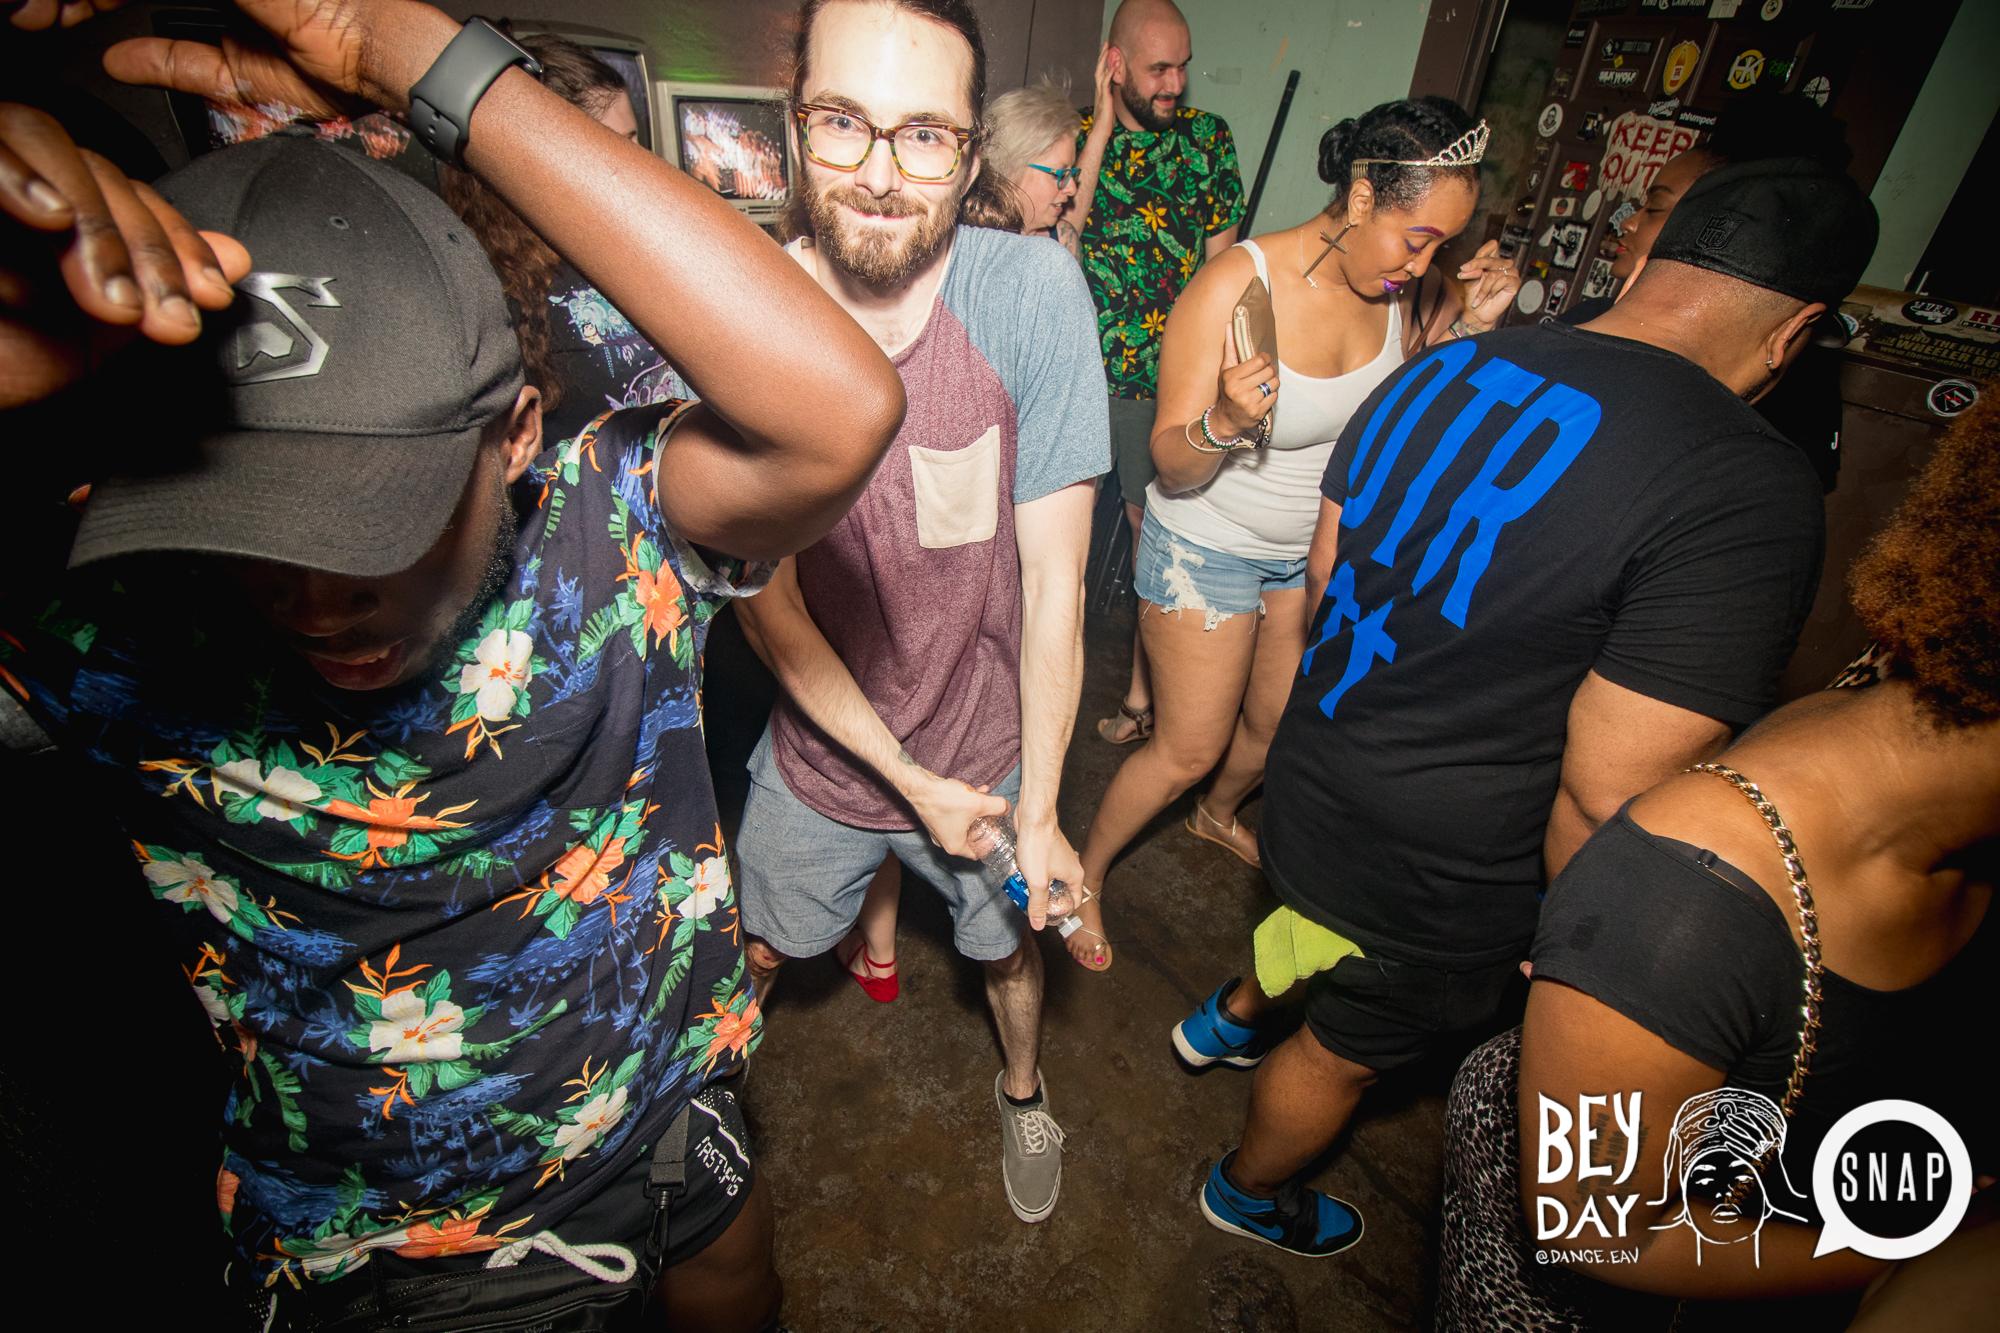 42Bey Day Grace Kelly The Basement Atlanta Oh Snap Kid.jpg